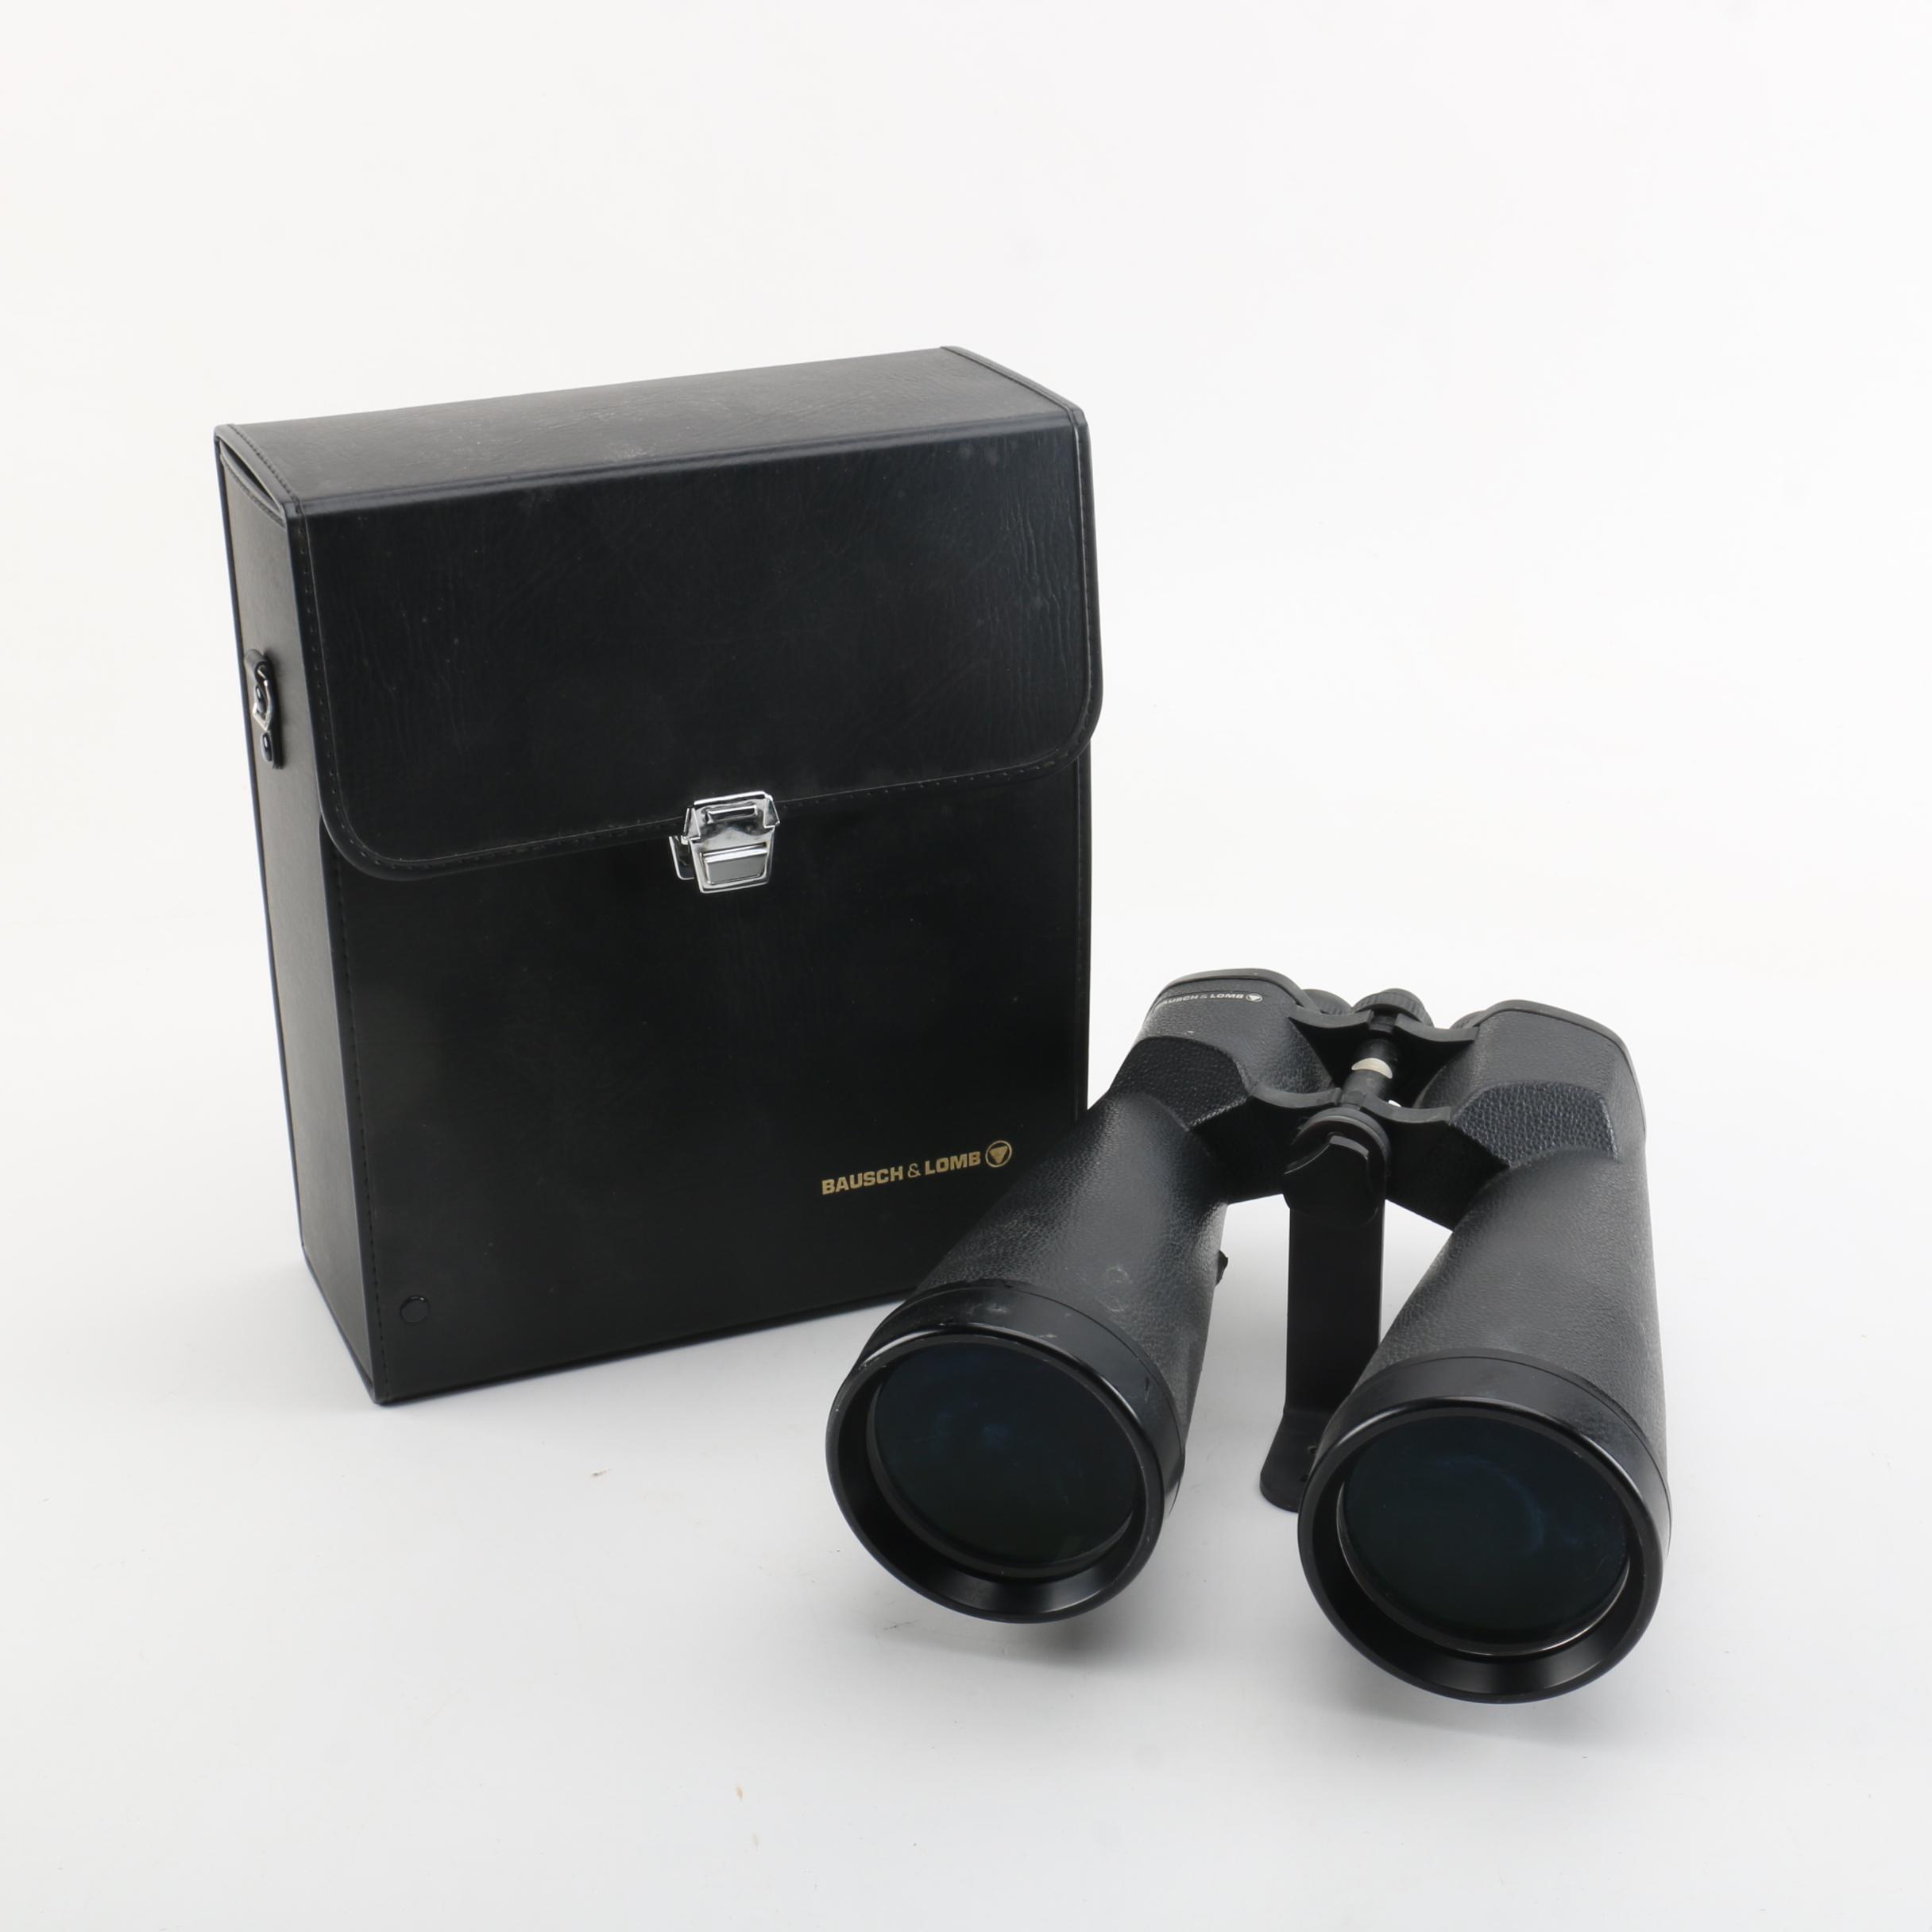 Bausch & Lomb 20 x 80 Astronomical/Terrestrial Binoculars